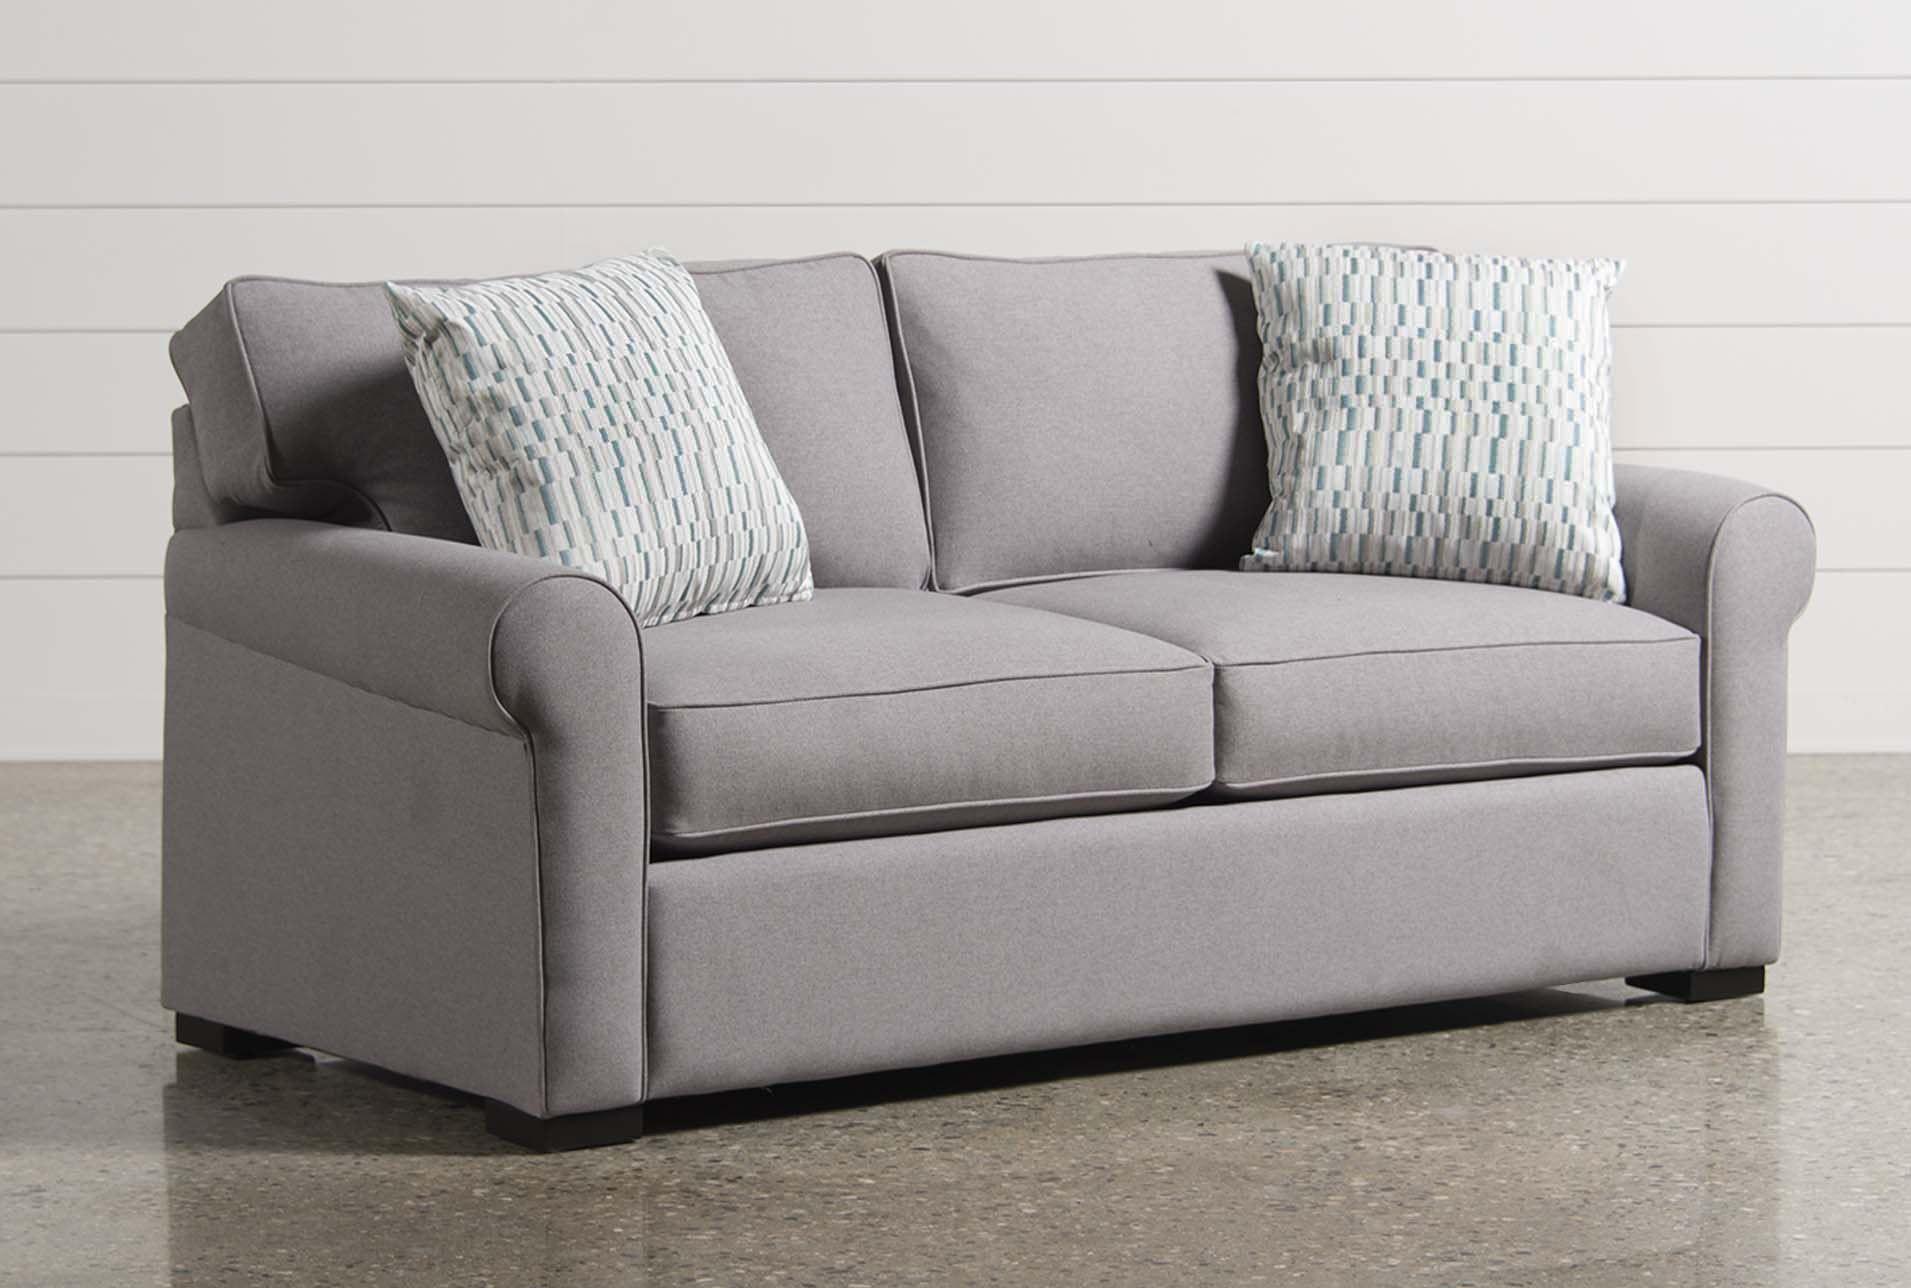 Mia Memory Foam Full Sleeper | Foam Sofa, Hardwood Design ... pour Sofa Dreams France